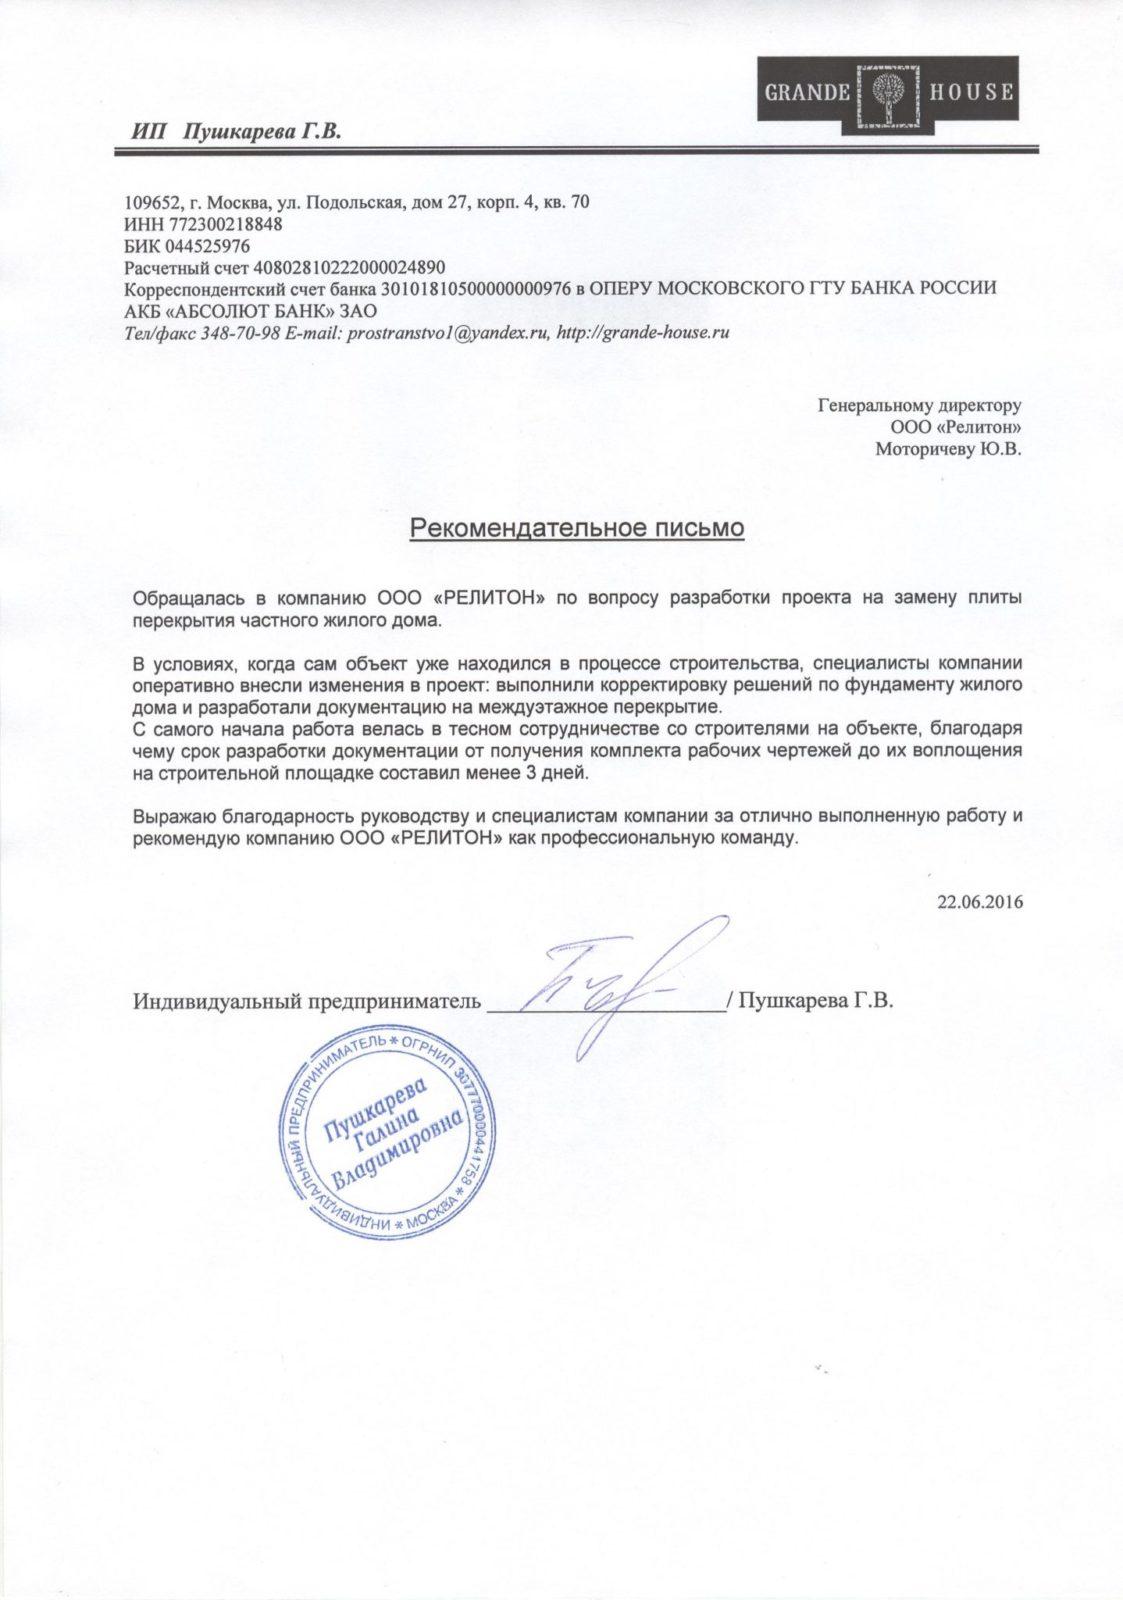 Otzyv_16_06_22_in_IP_Pushkareva.jpg